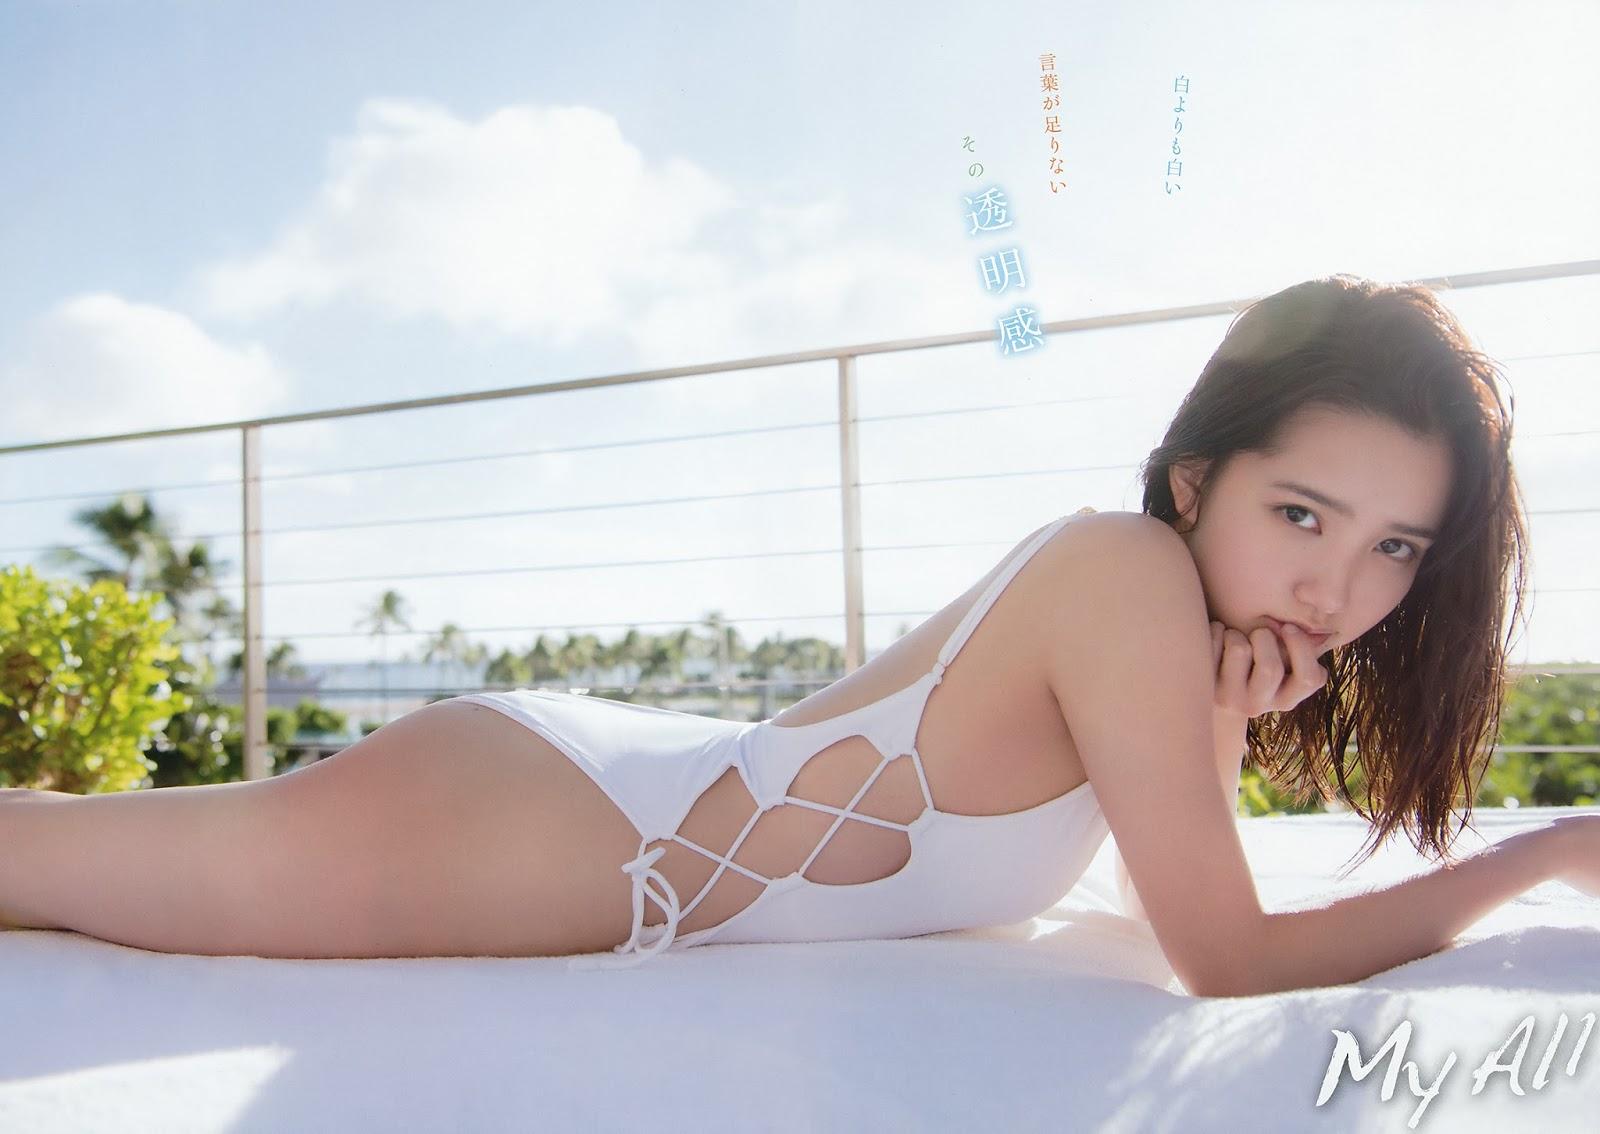 Kato Rena 加藤玲奈, Young Animal 2018 No.07 (ヤングアニマル 2018年7号)